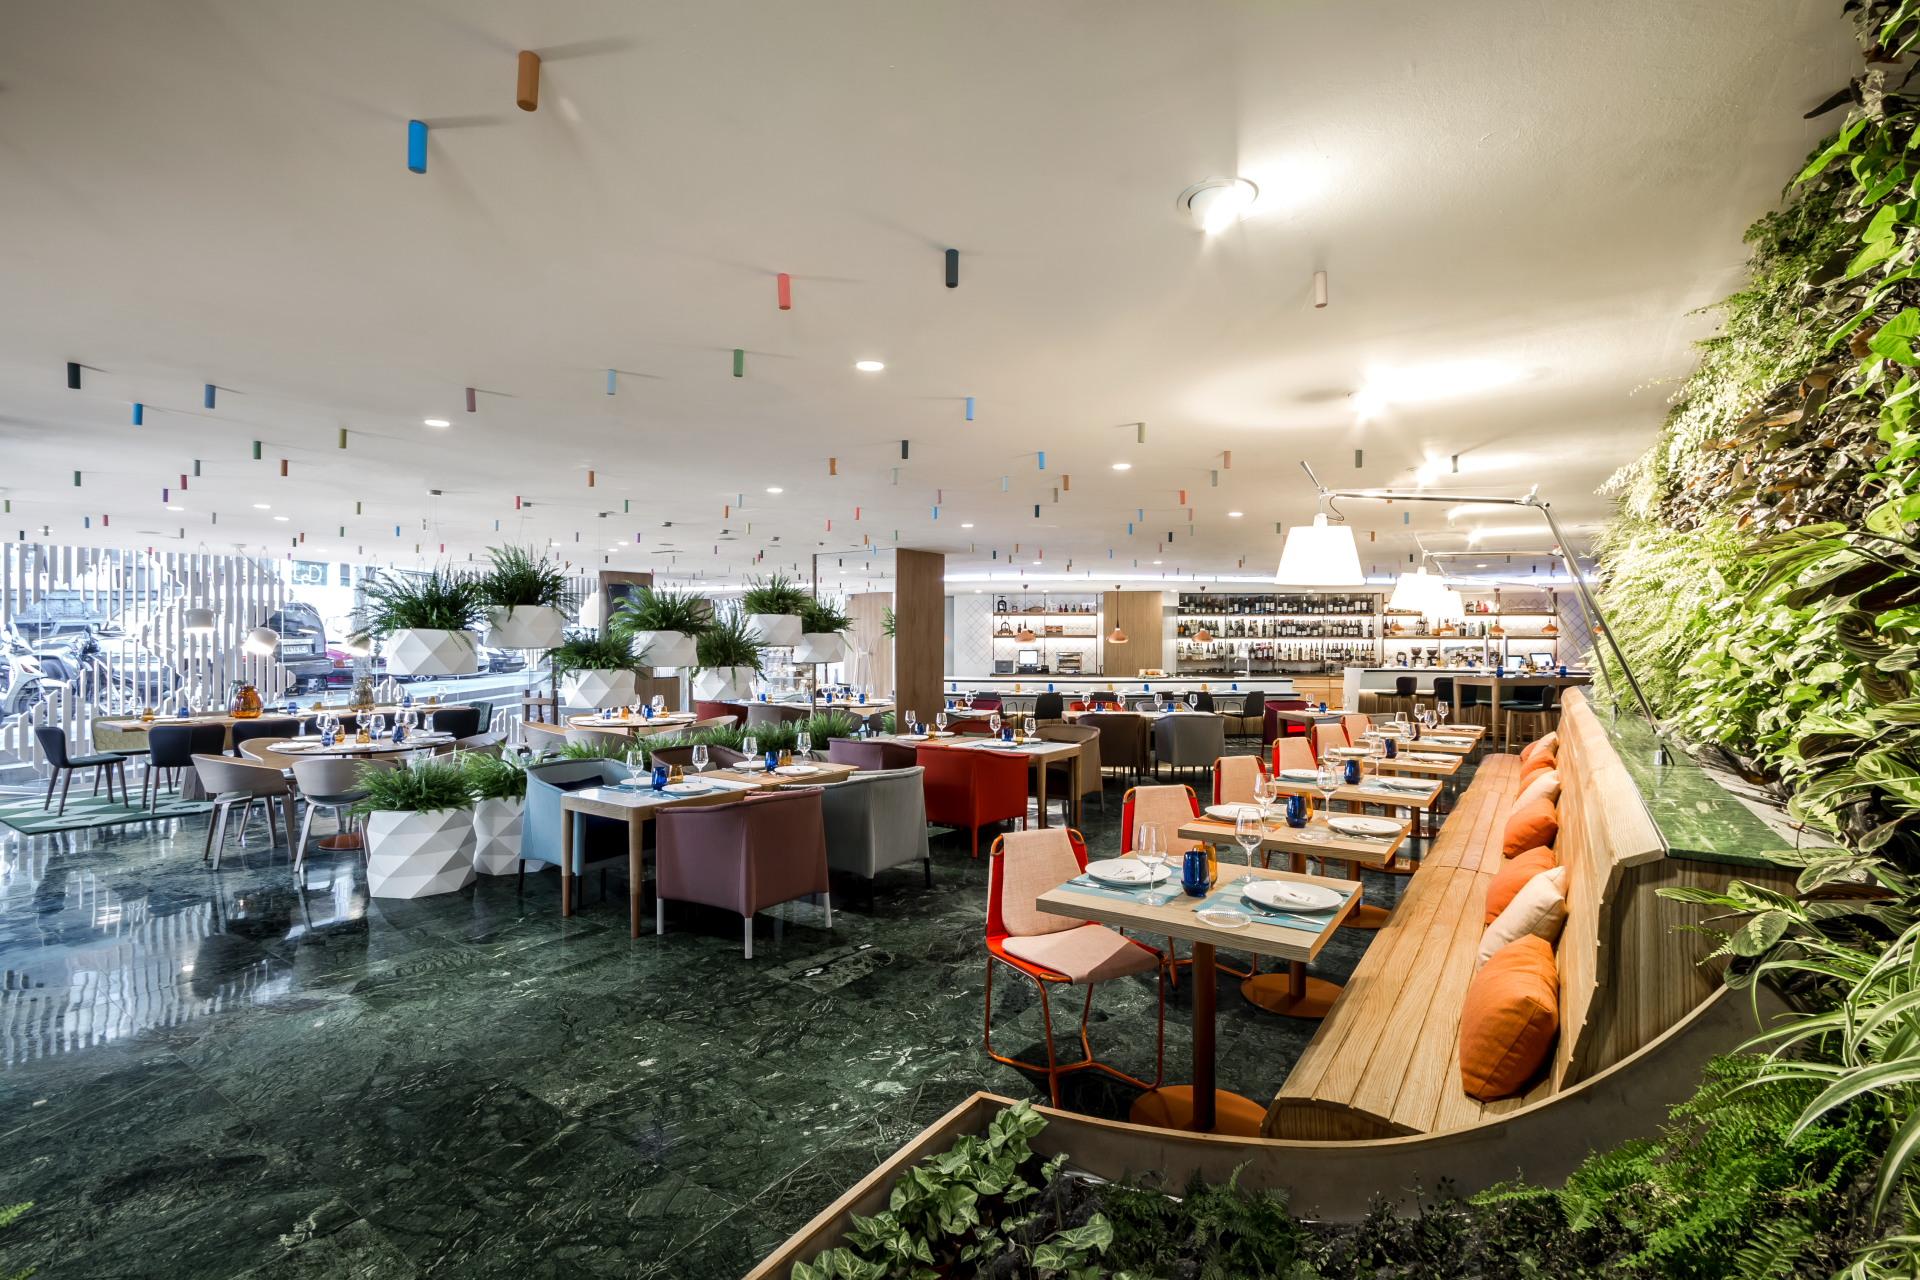 fotografia-arquitectura-valencia-german-cabo-estudihac-poncelet-cheese-bar-barcelona (10)